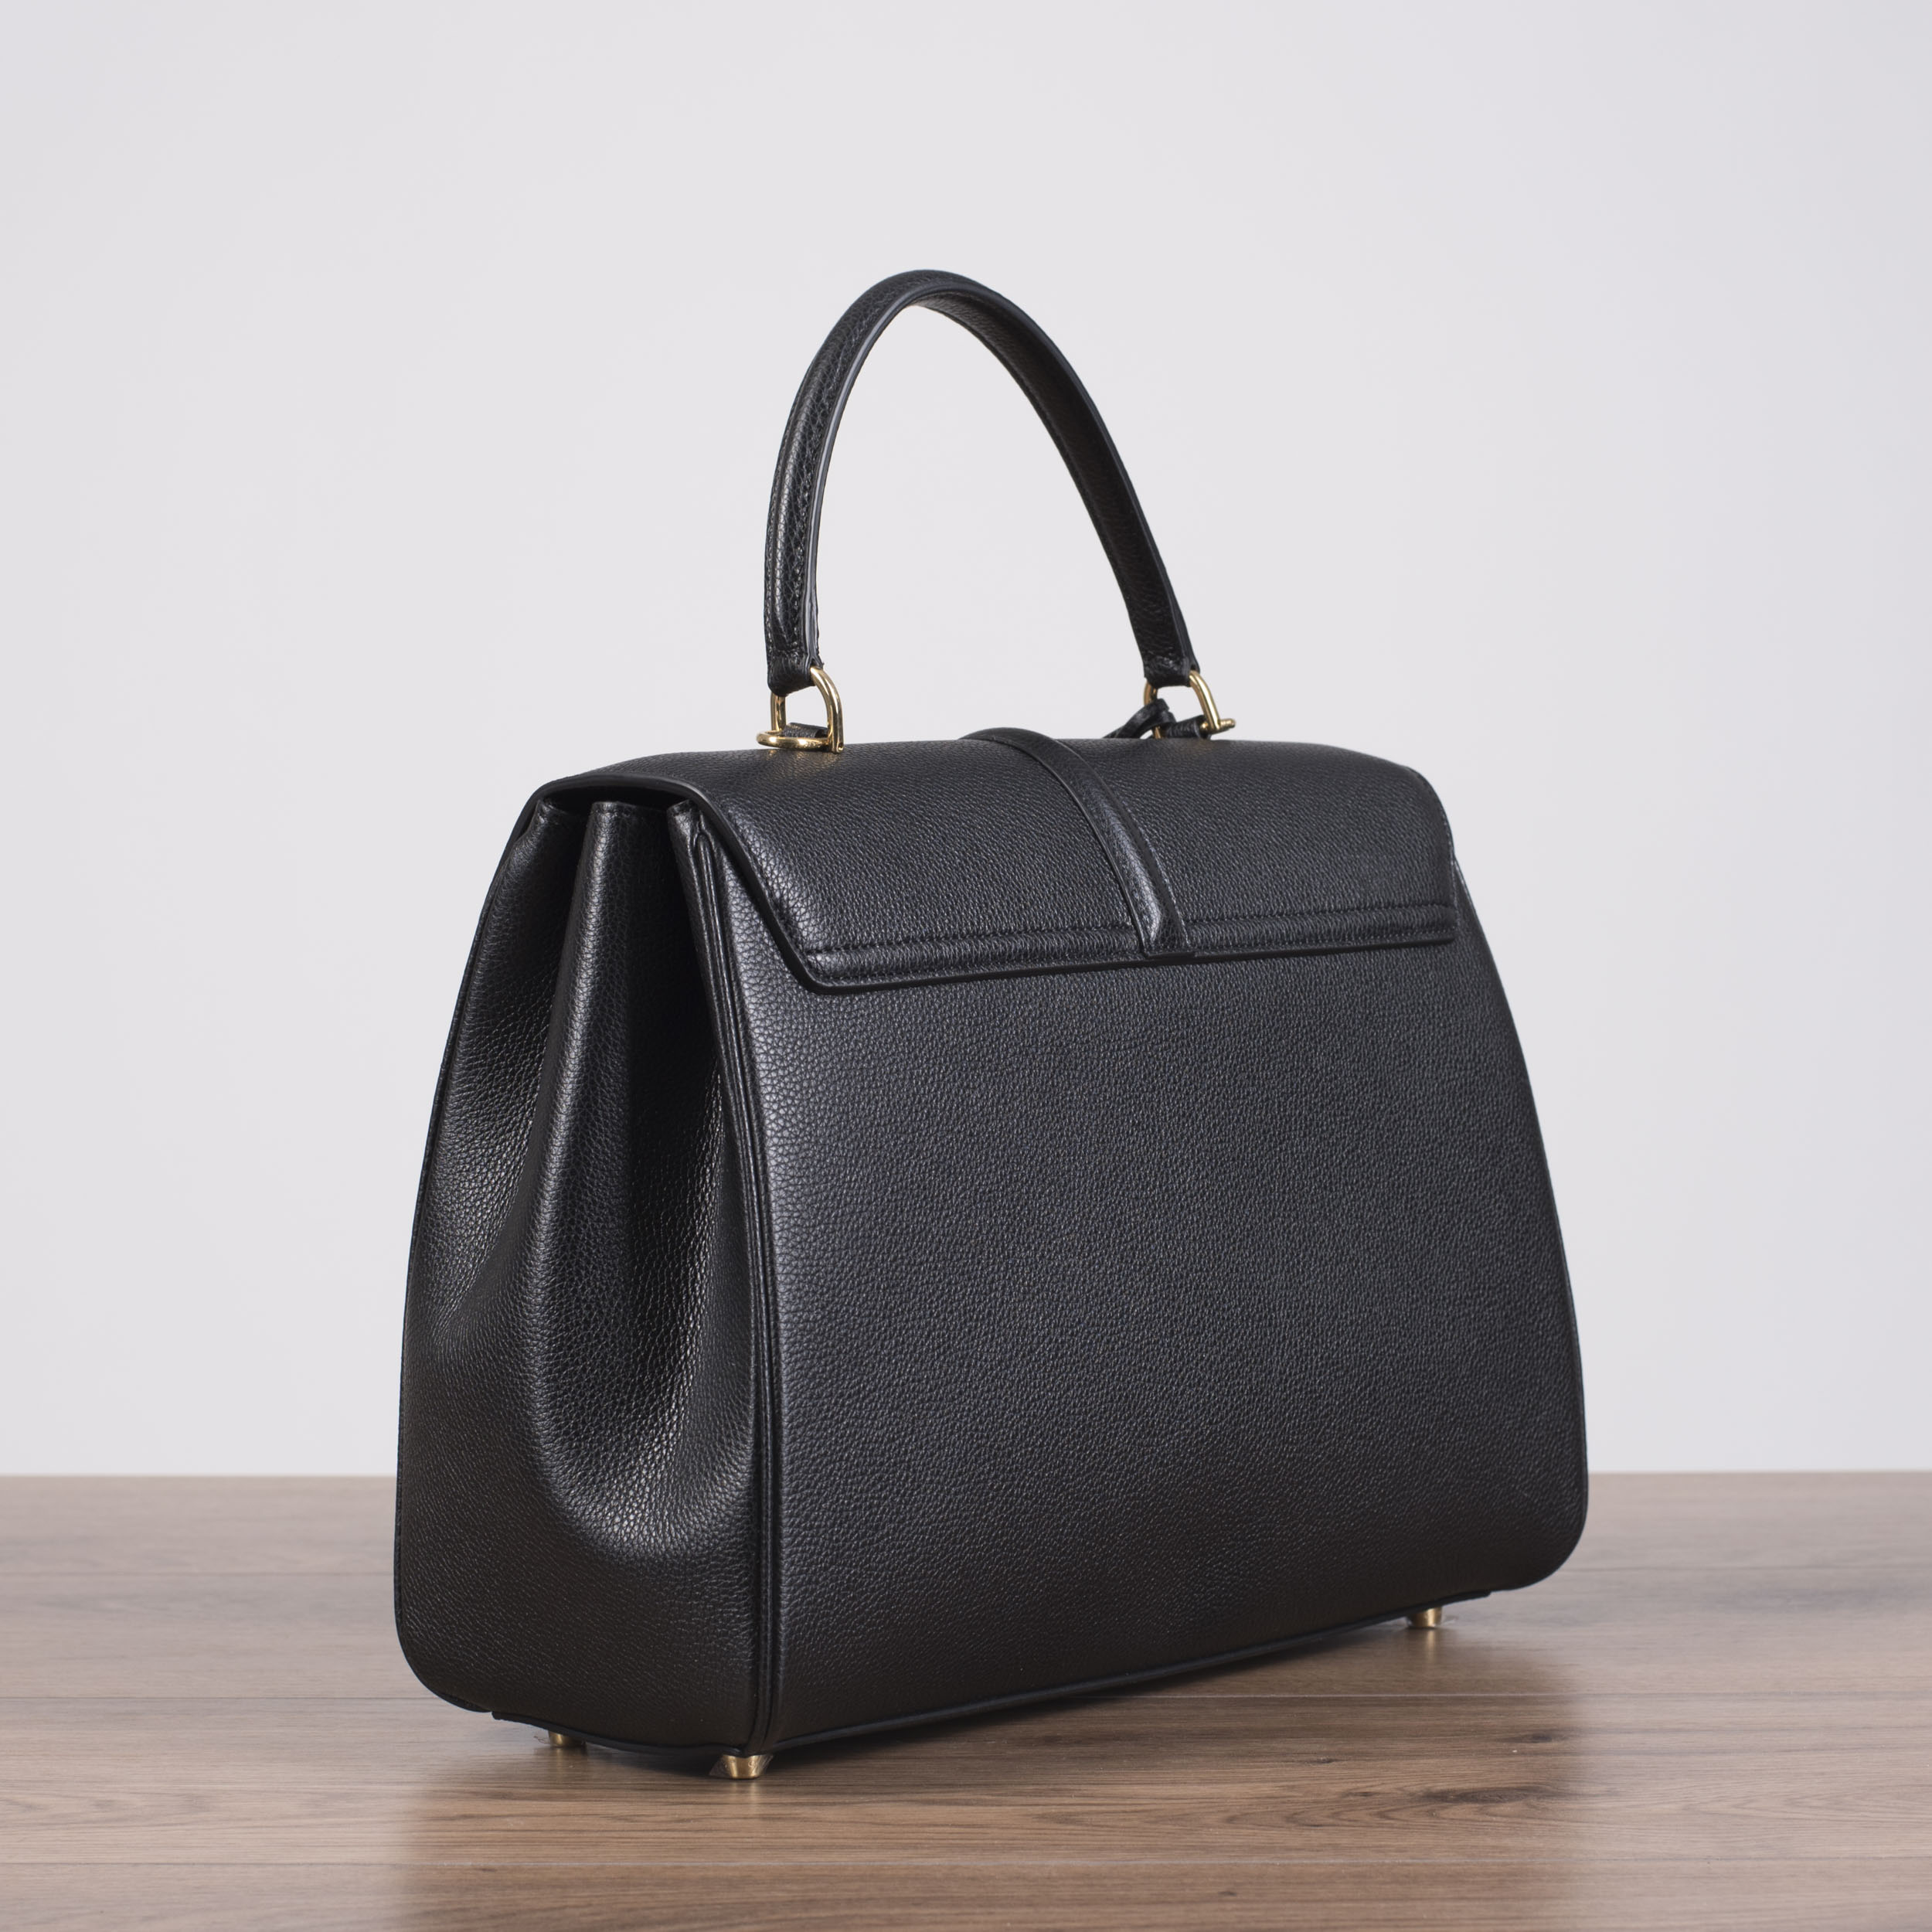 24f1dfc8de08 CELINE 4550  Medium 16 Bag In Black Grained Calfskin